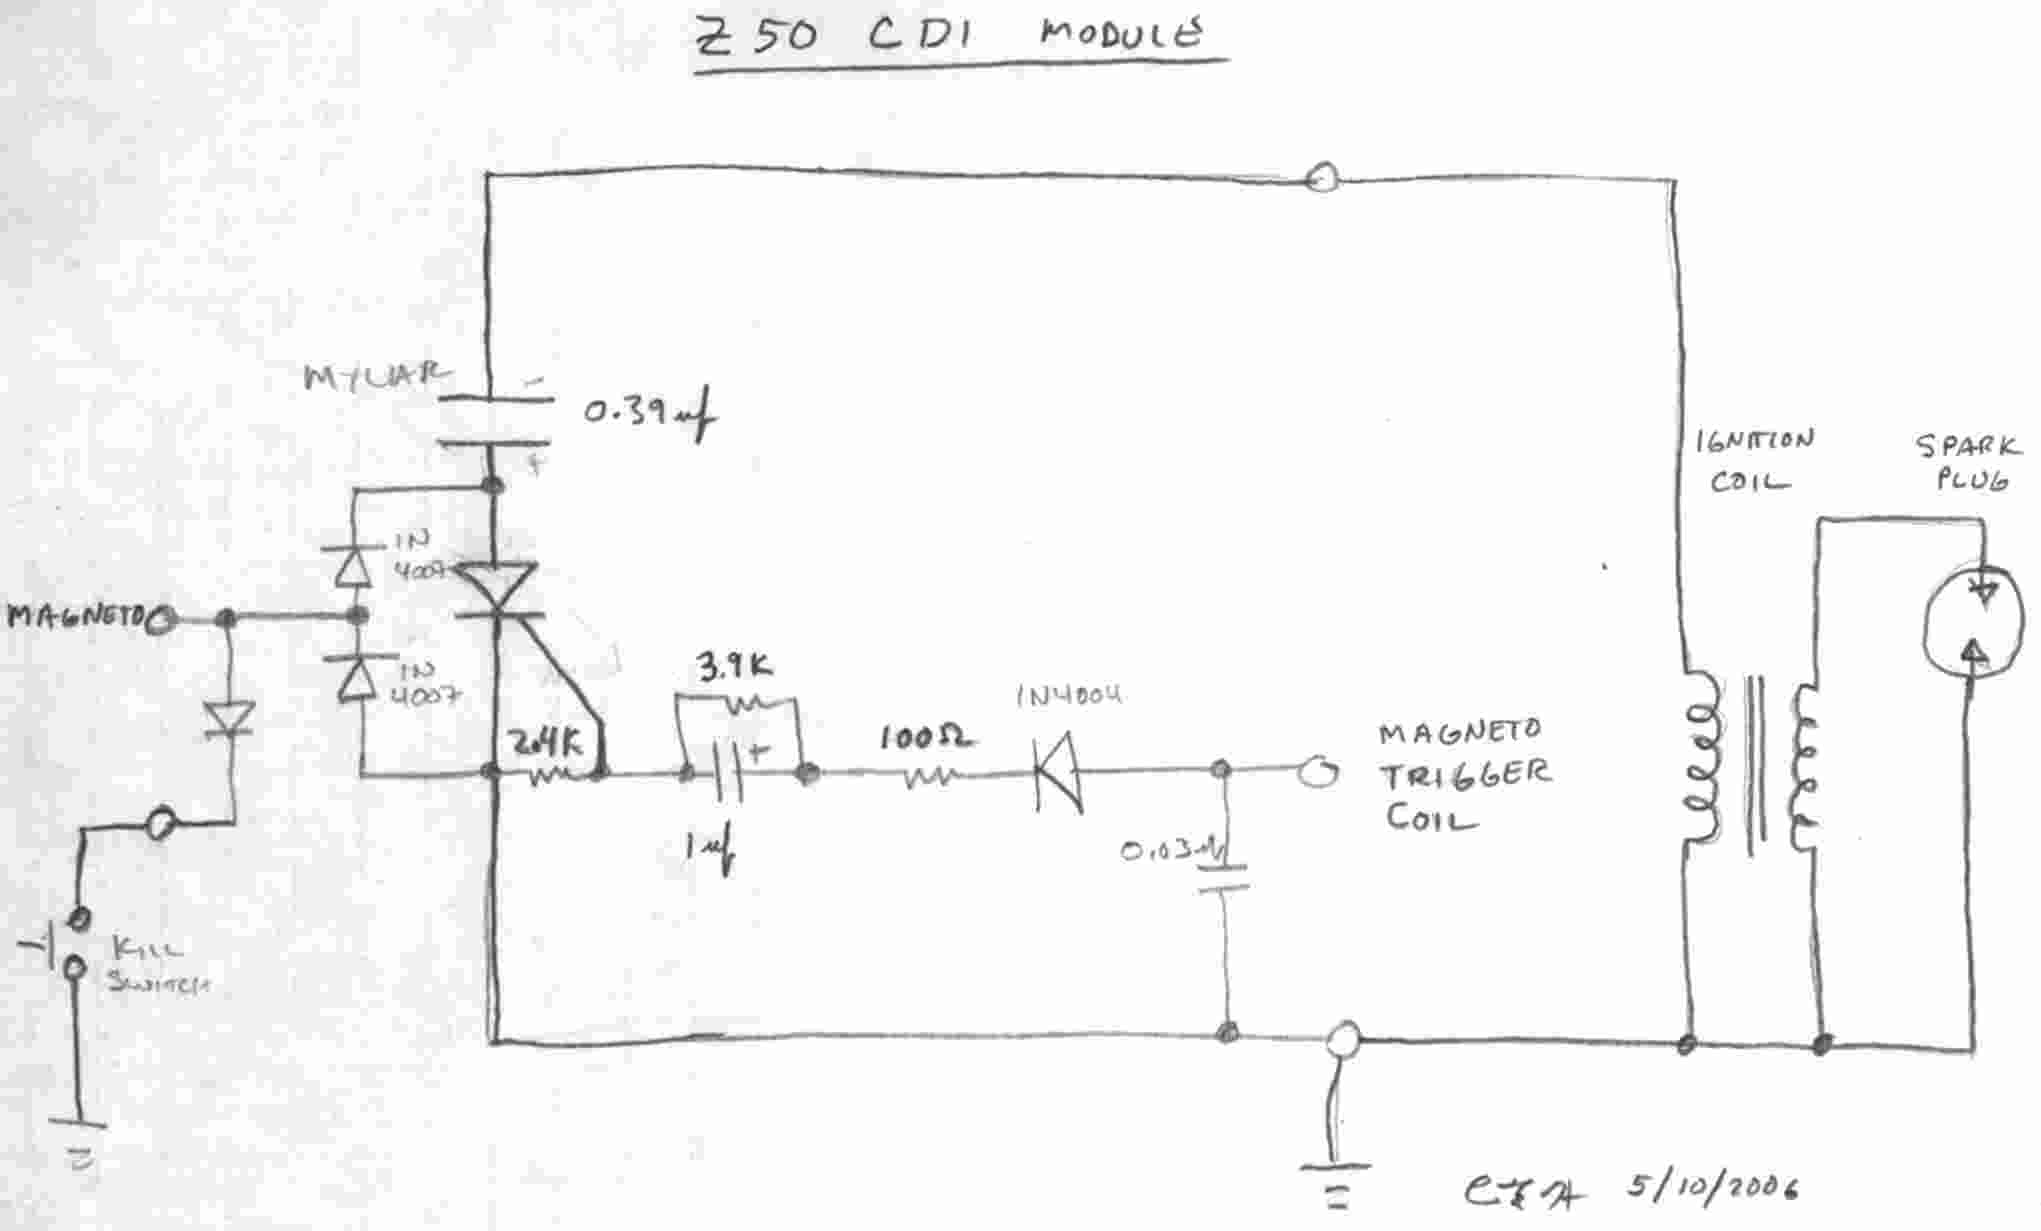 Sl125 Wiring Diagram Libraries Honda St90 Electrical S65 Database Libraryhonda Sl100 Blog